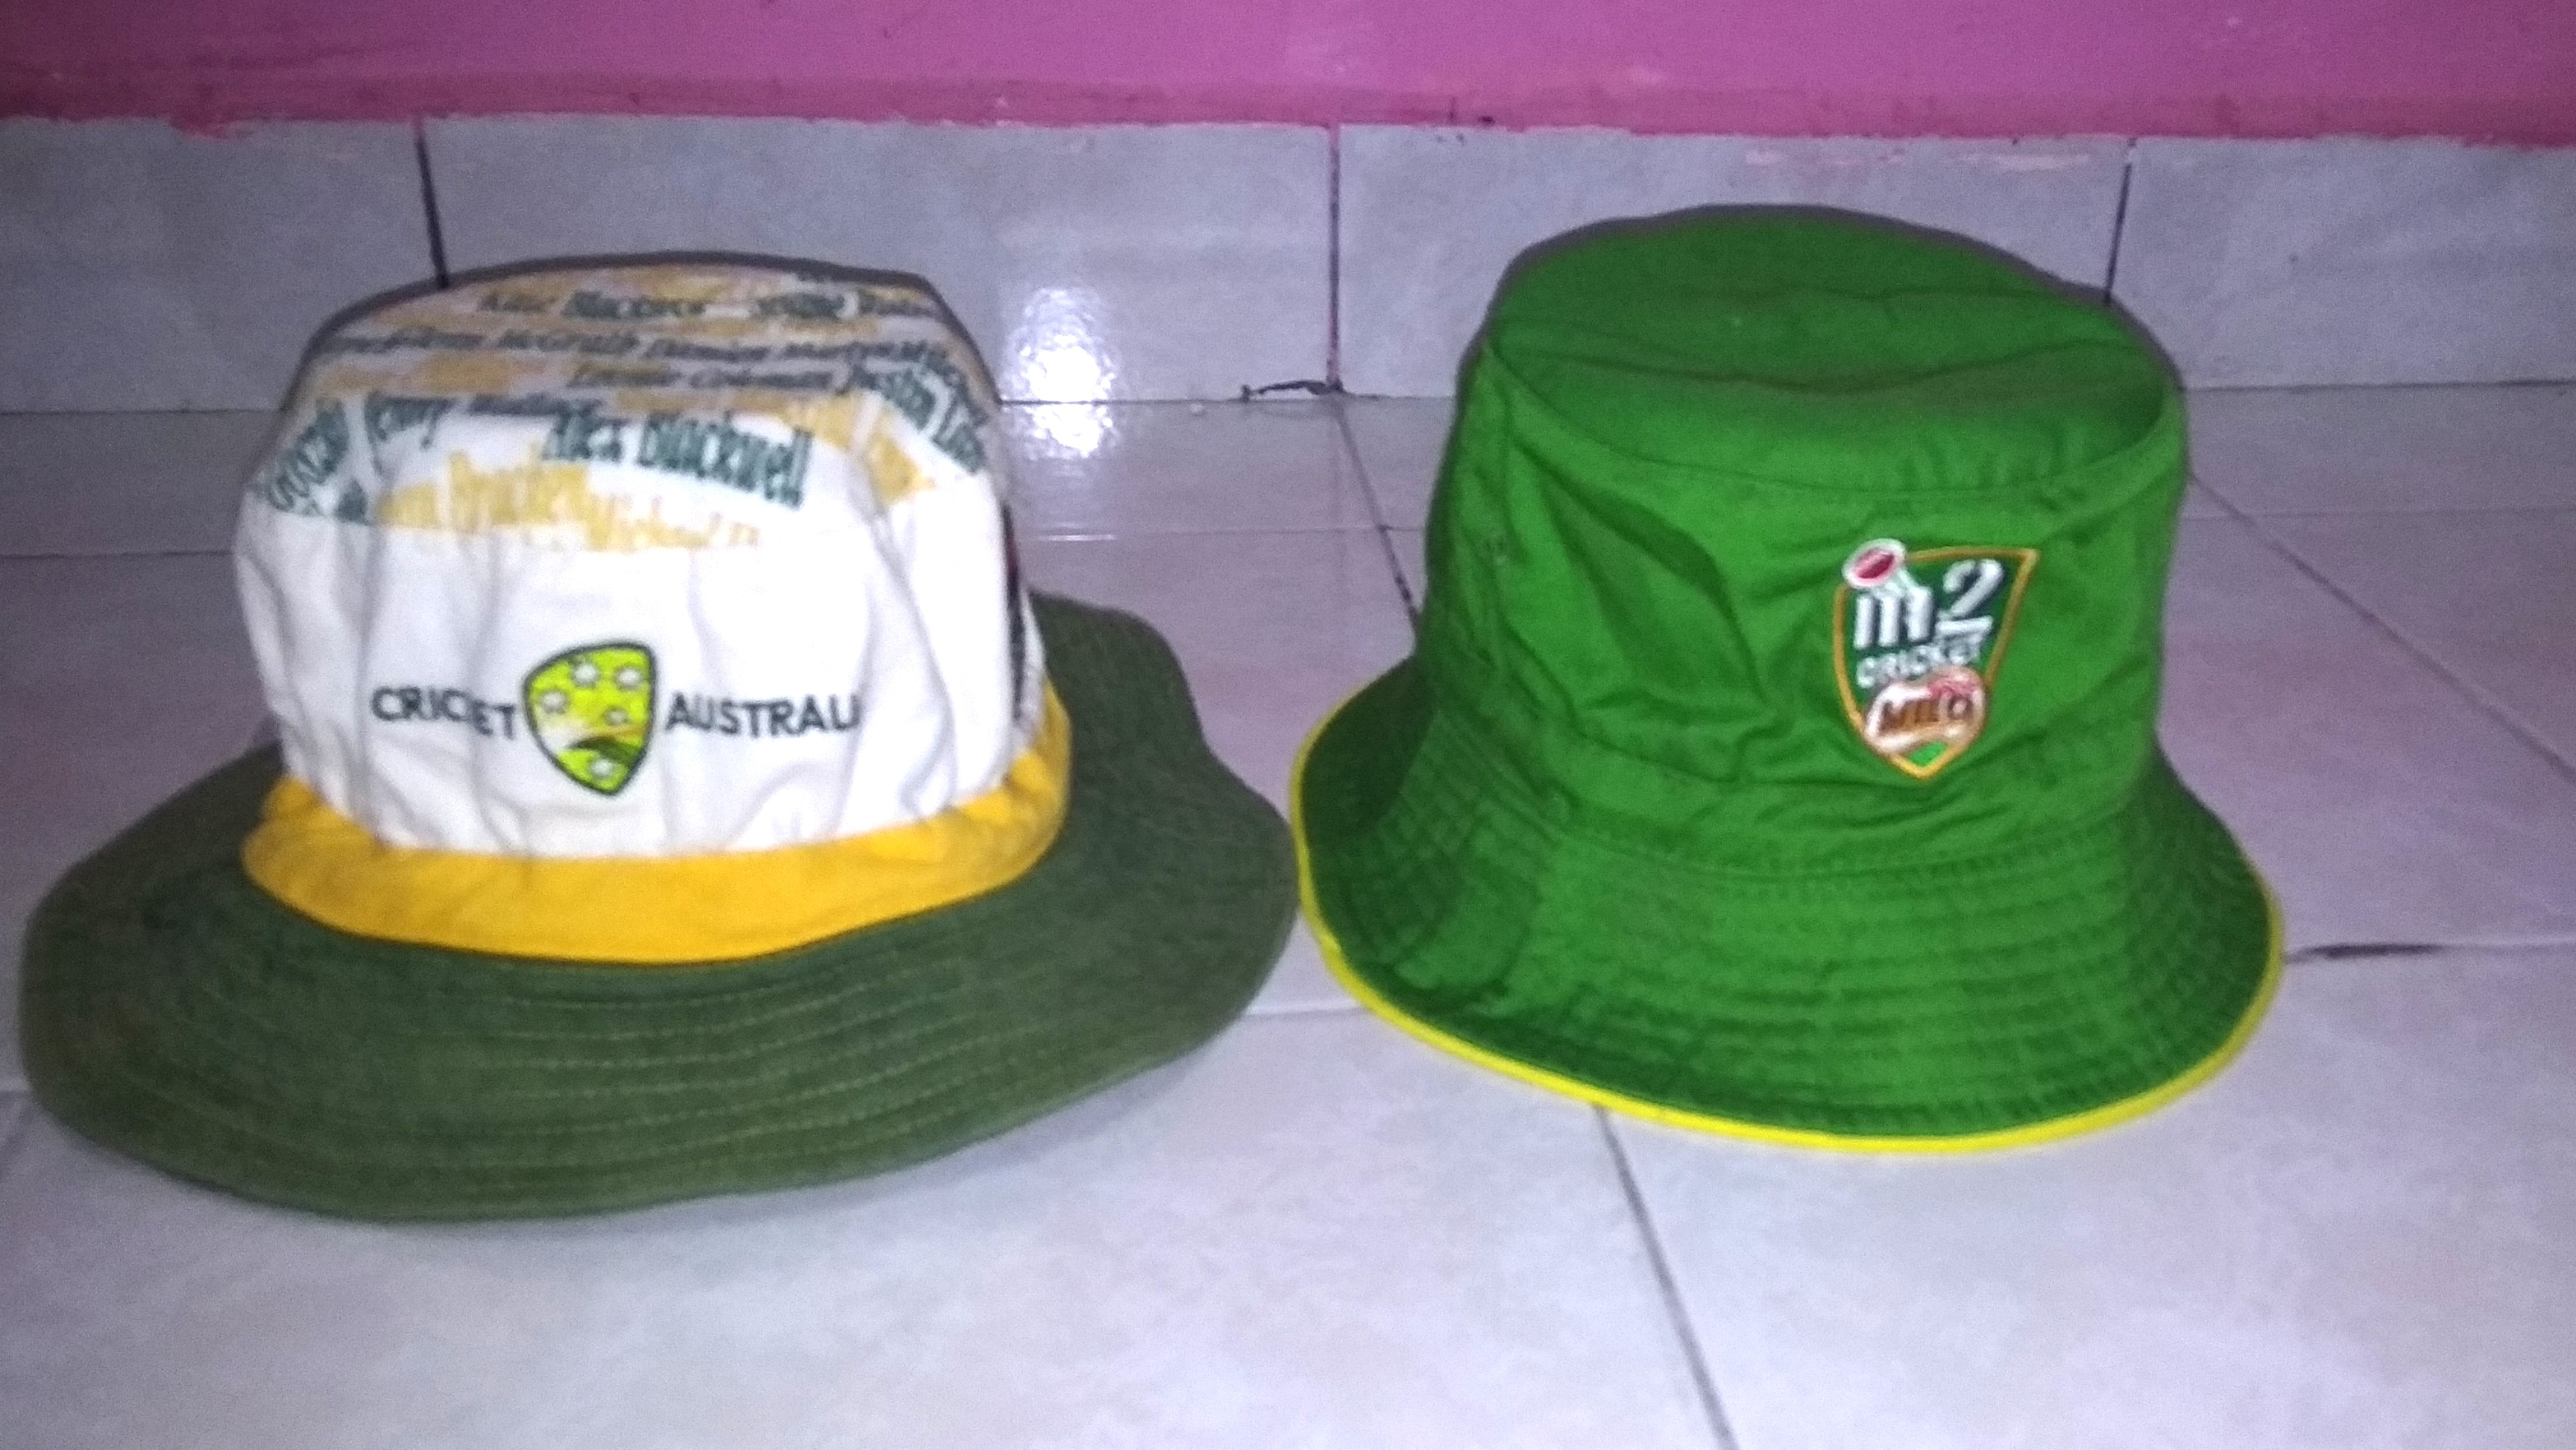 952e4b43809 Lot Bucket Hat Milo Cricket Australia